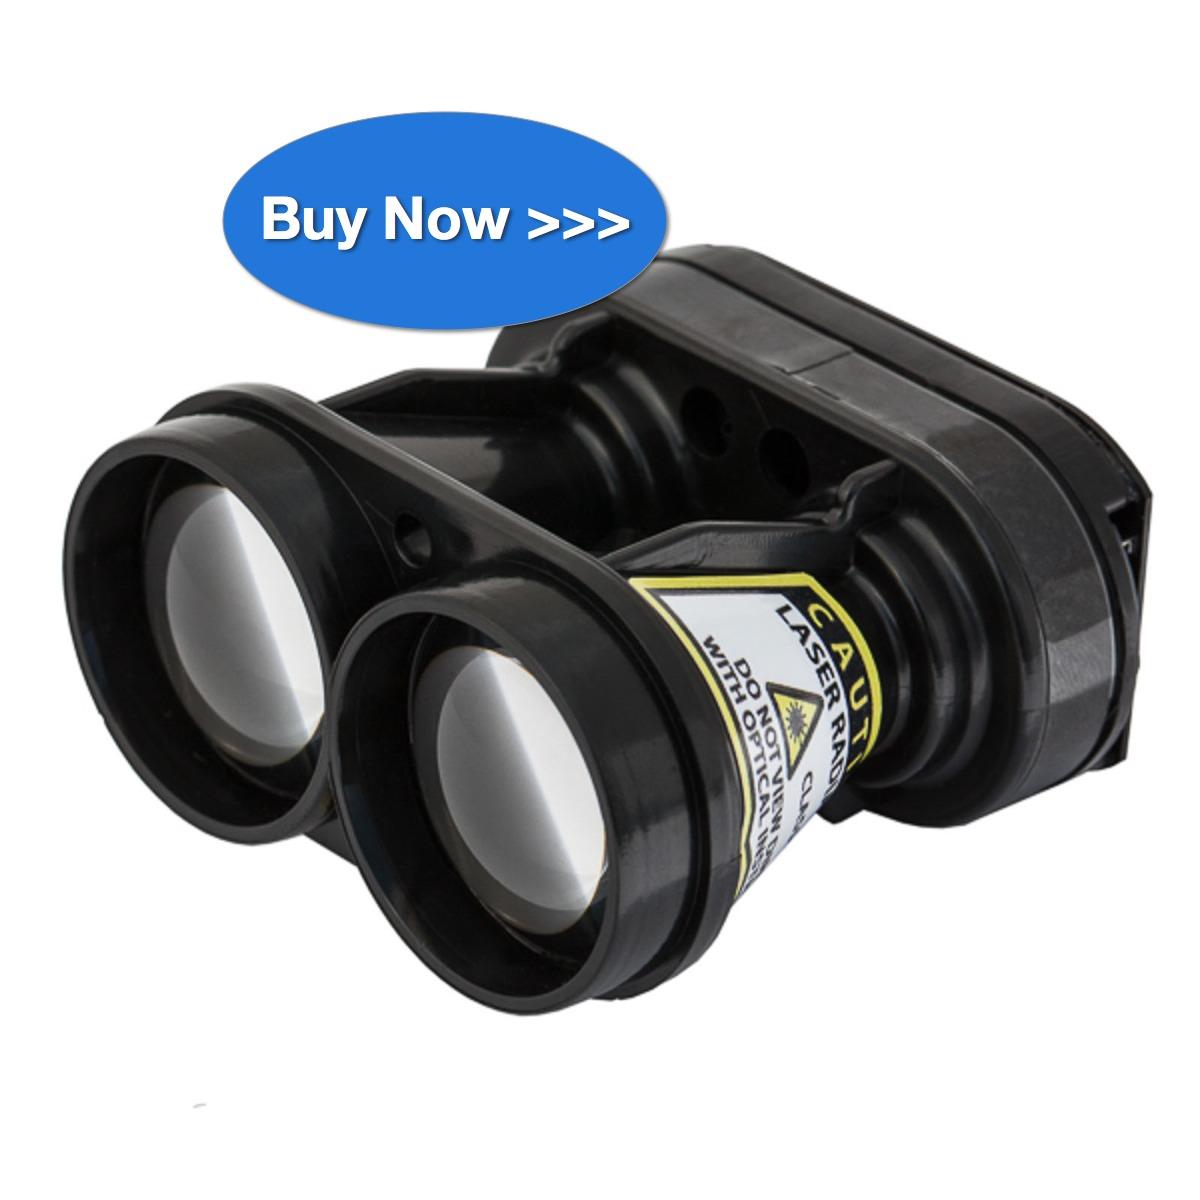 LightWare SF30-B buy at Acroname